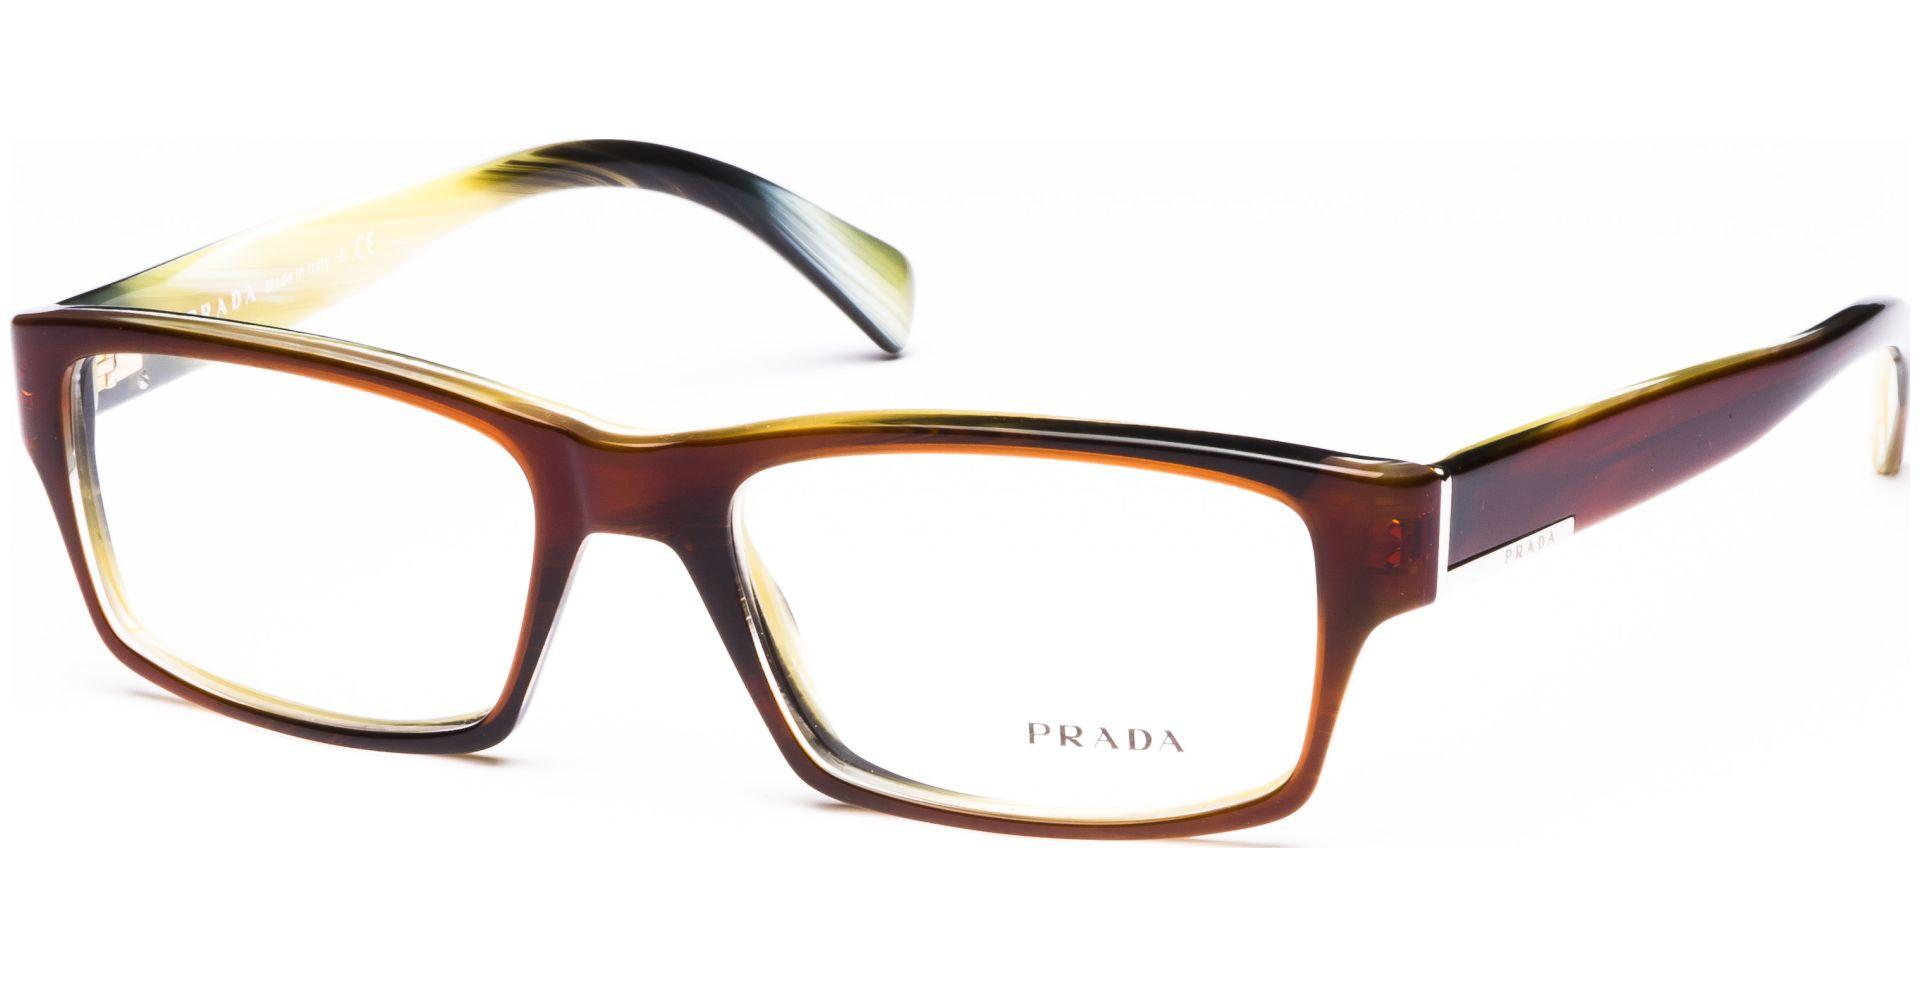 Prada - PR06OV EAP1O1 5317 Top Striped Brown/Horn - von Lensbest